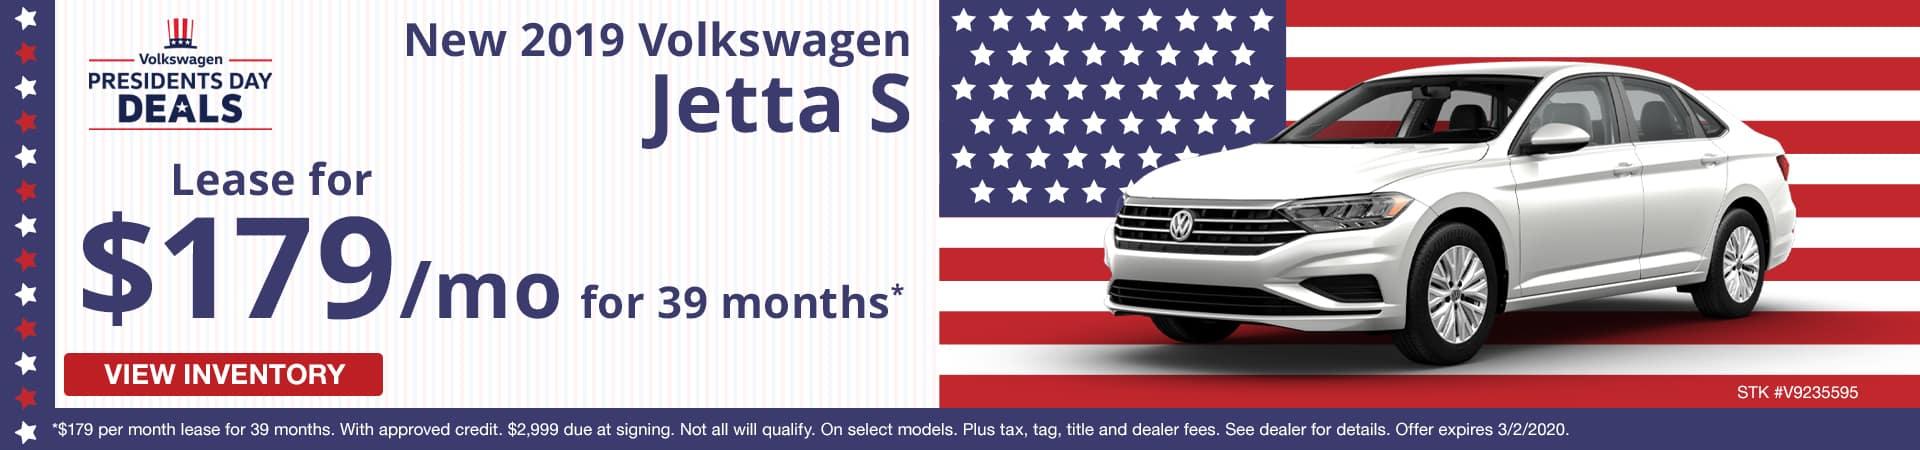 Lease a new 2019 Volkswagen Jetta S for $179 a month in Murfreesboro TN